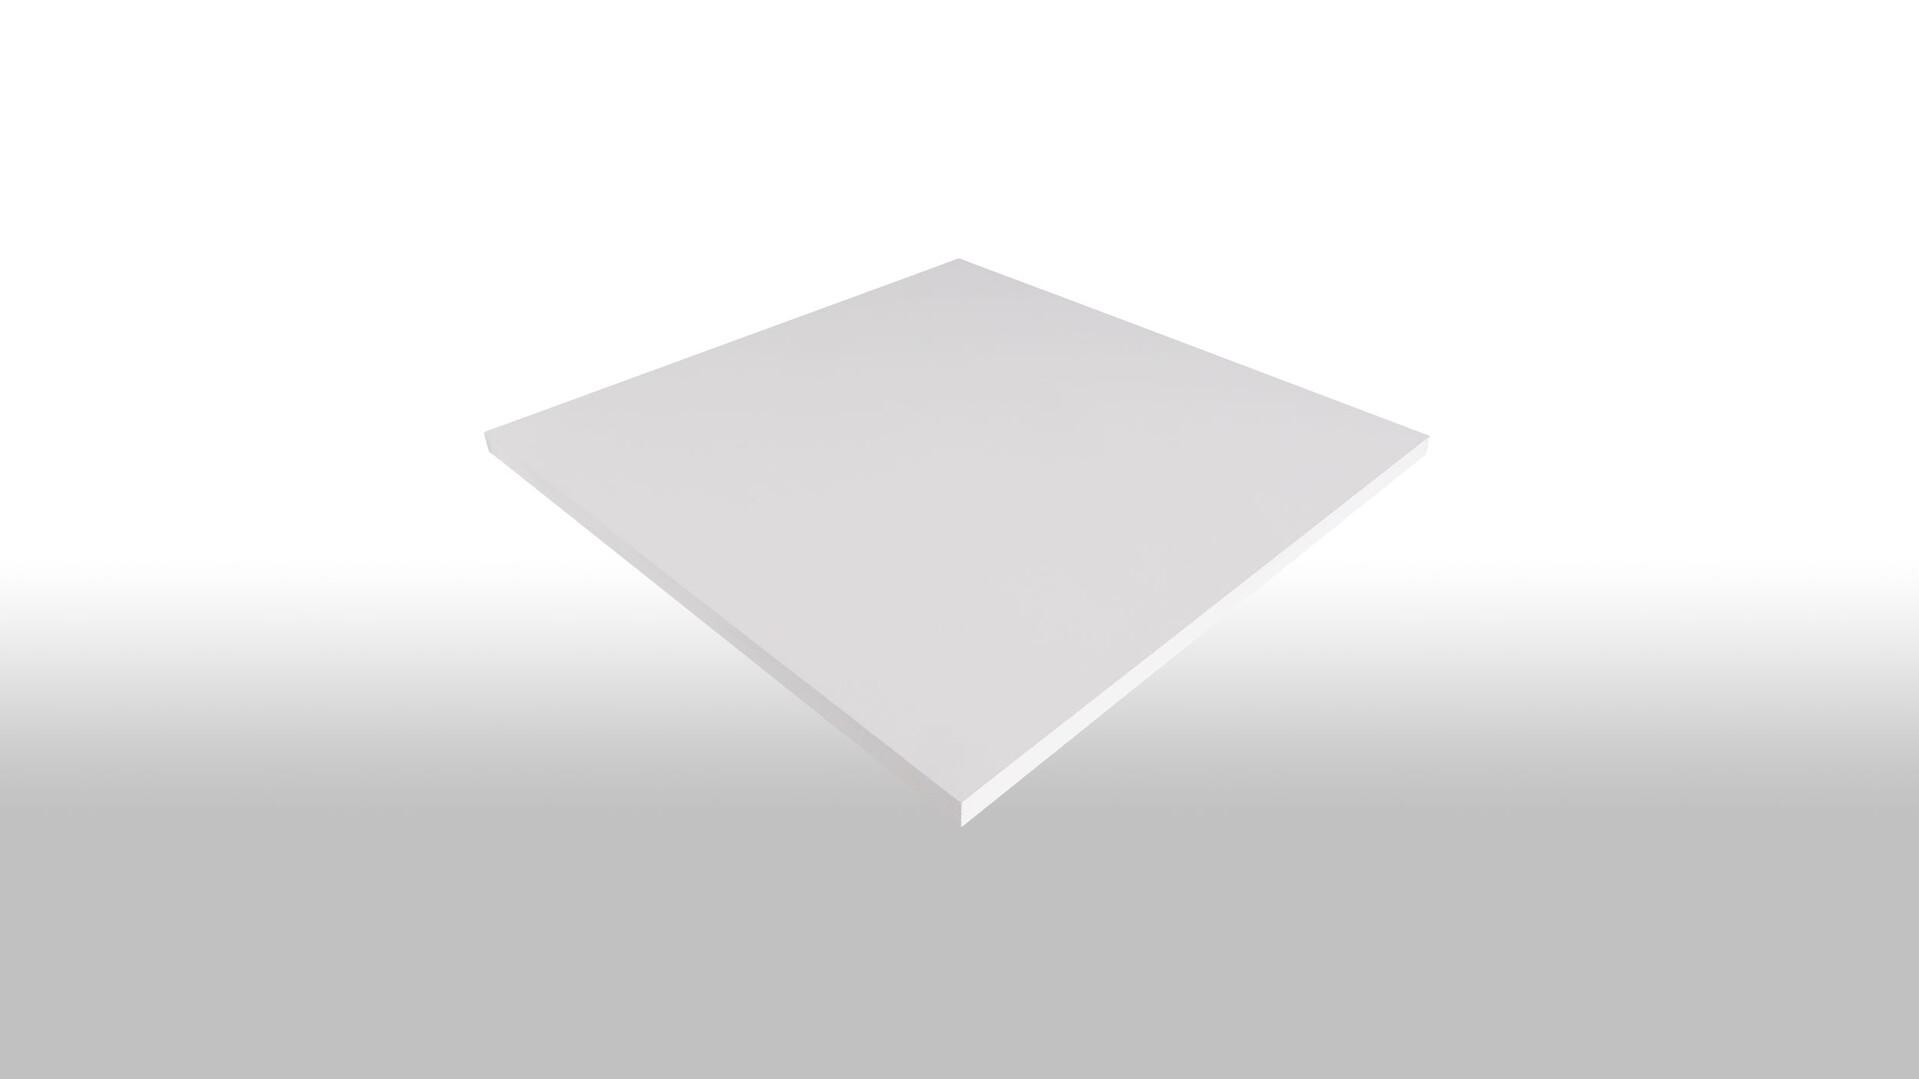 Rockfon-Eclipse_Tile-surface